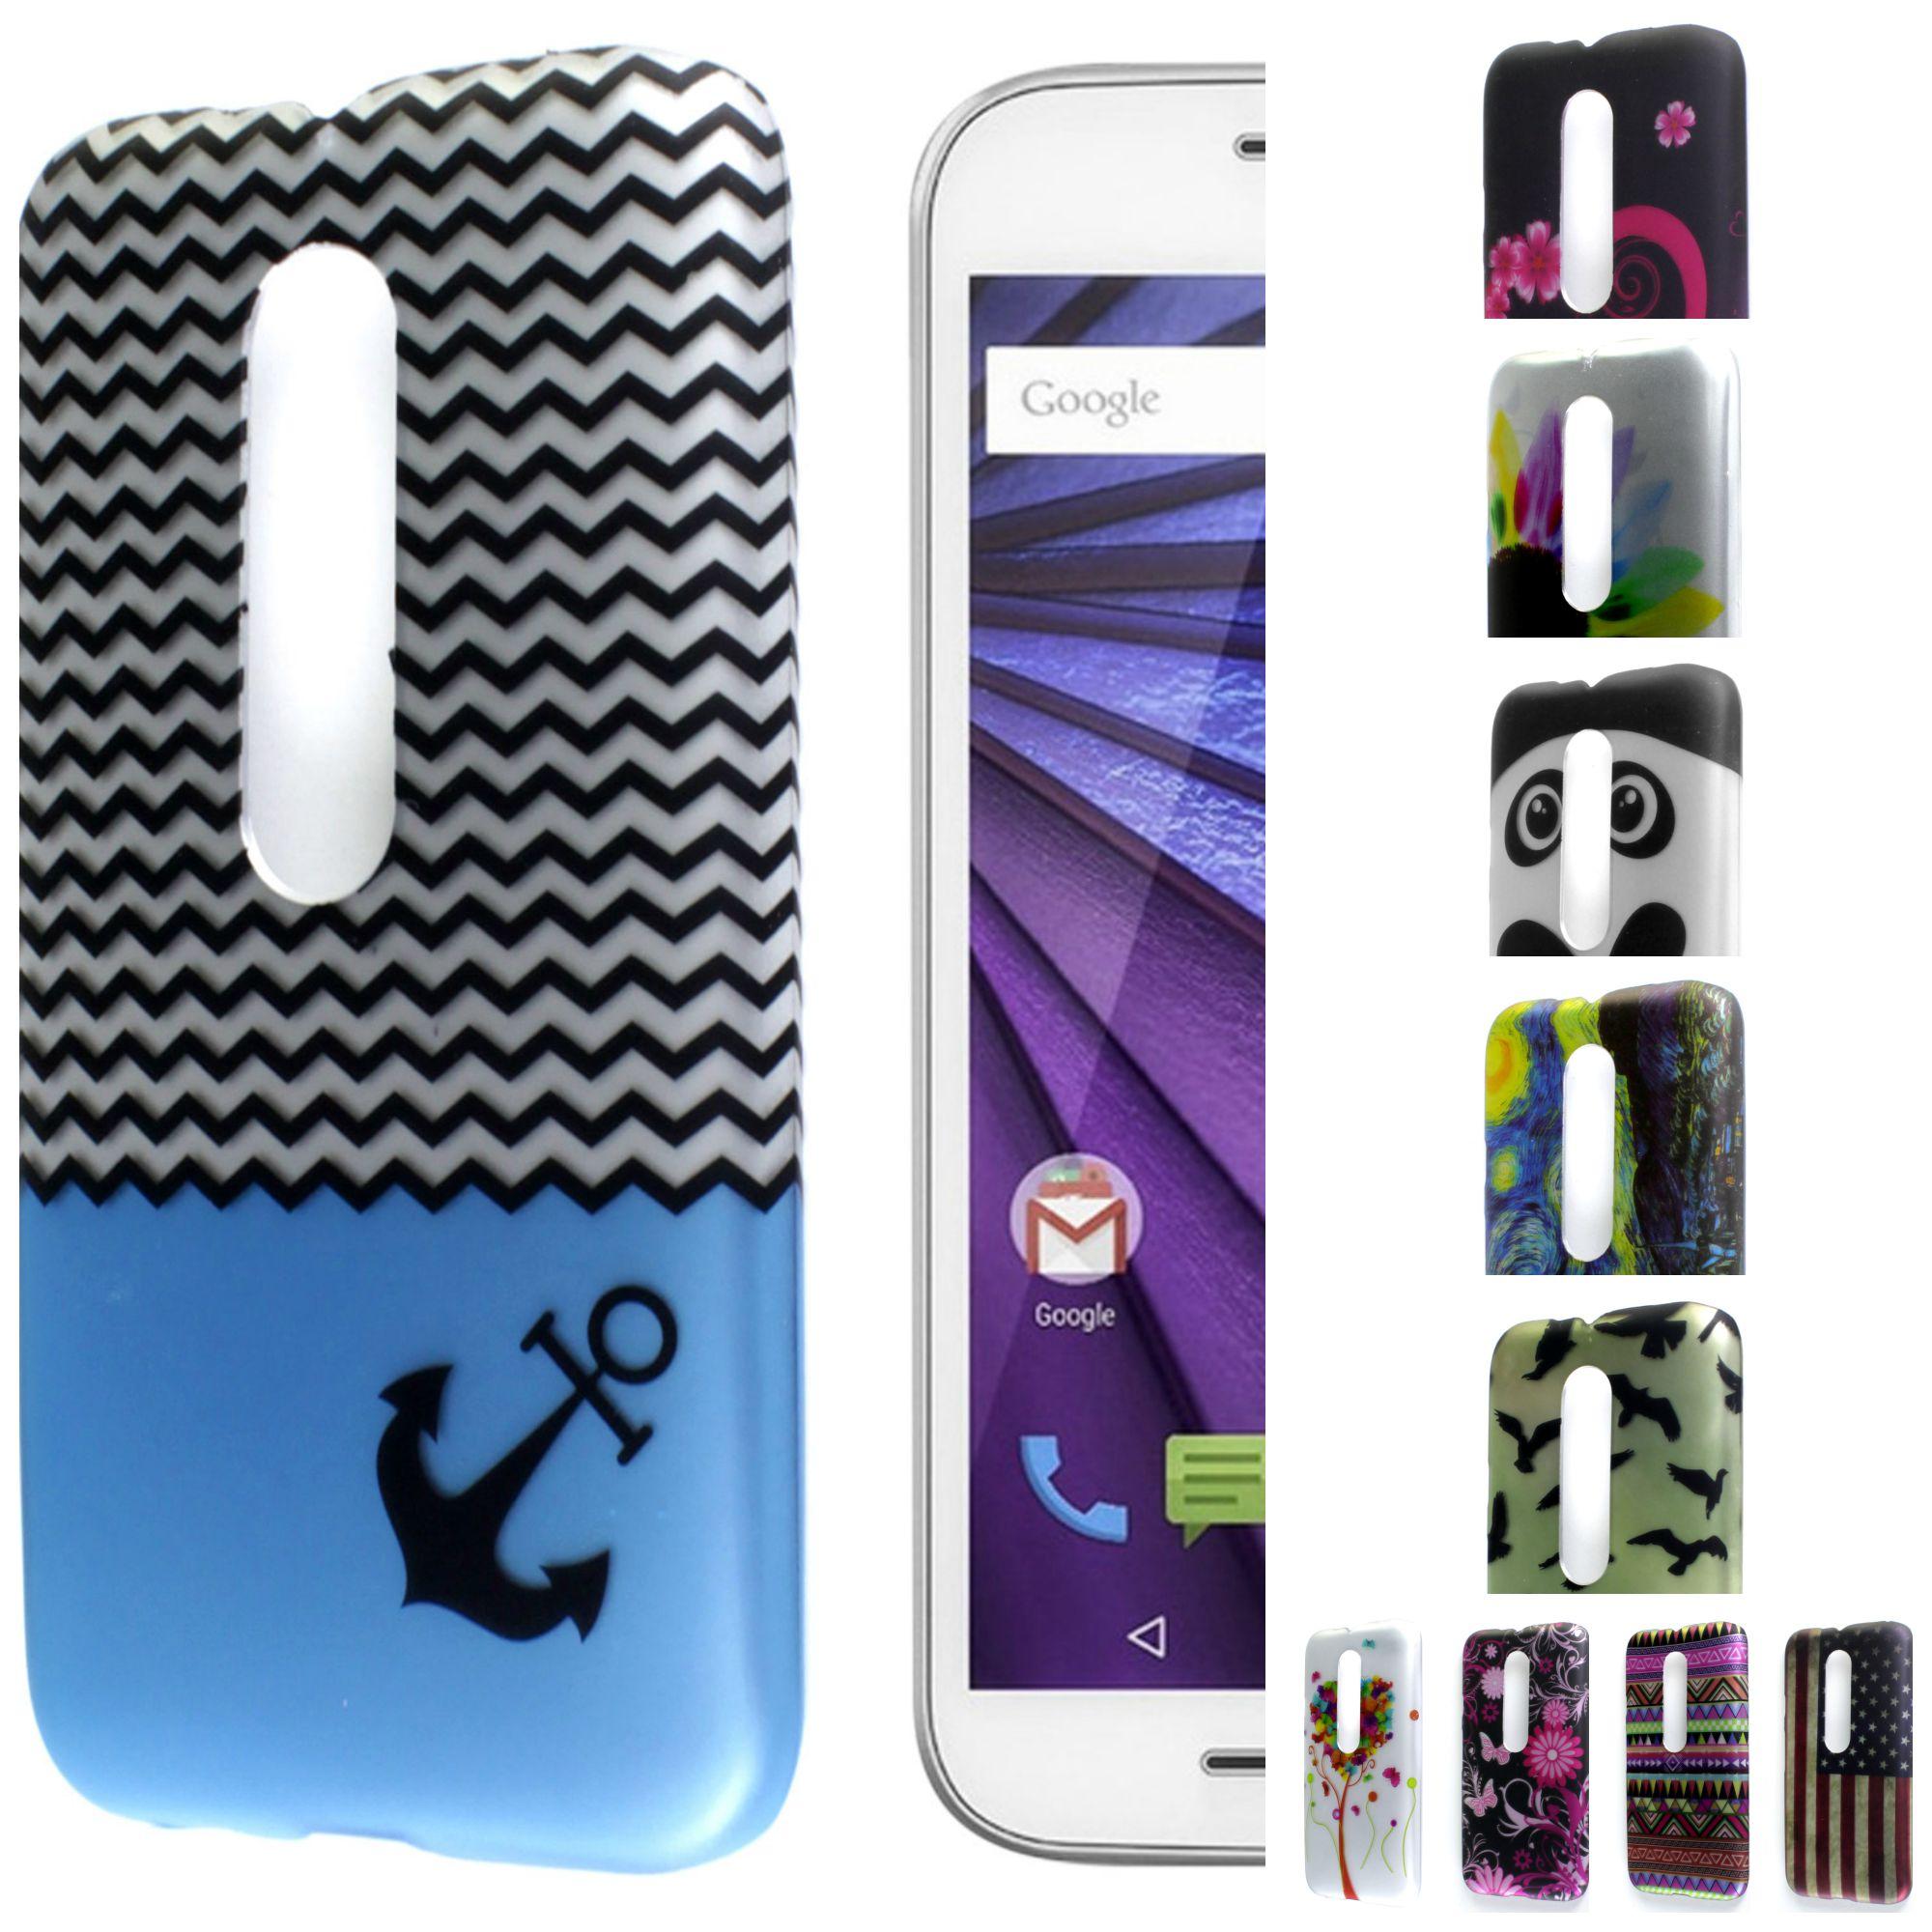 finest selection 34369 25057 Details about For Motorola Moto G (3rd Gen 2015) Case Hard Slim Design  Phone Cover Accessory